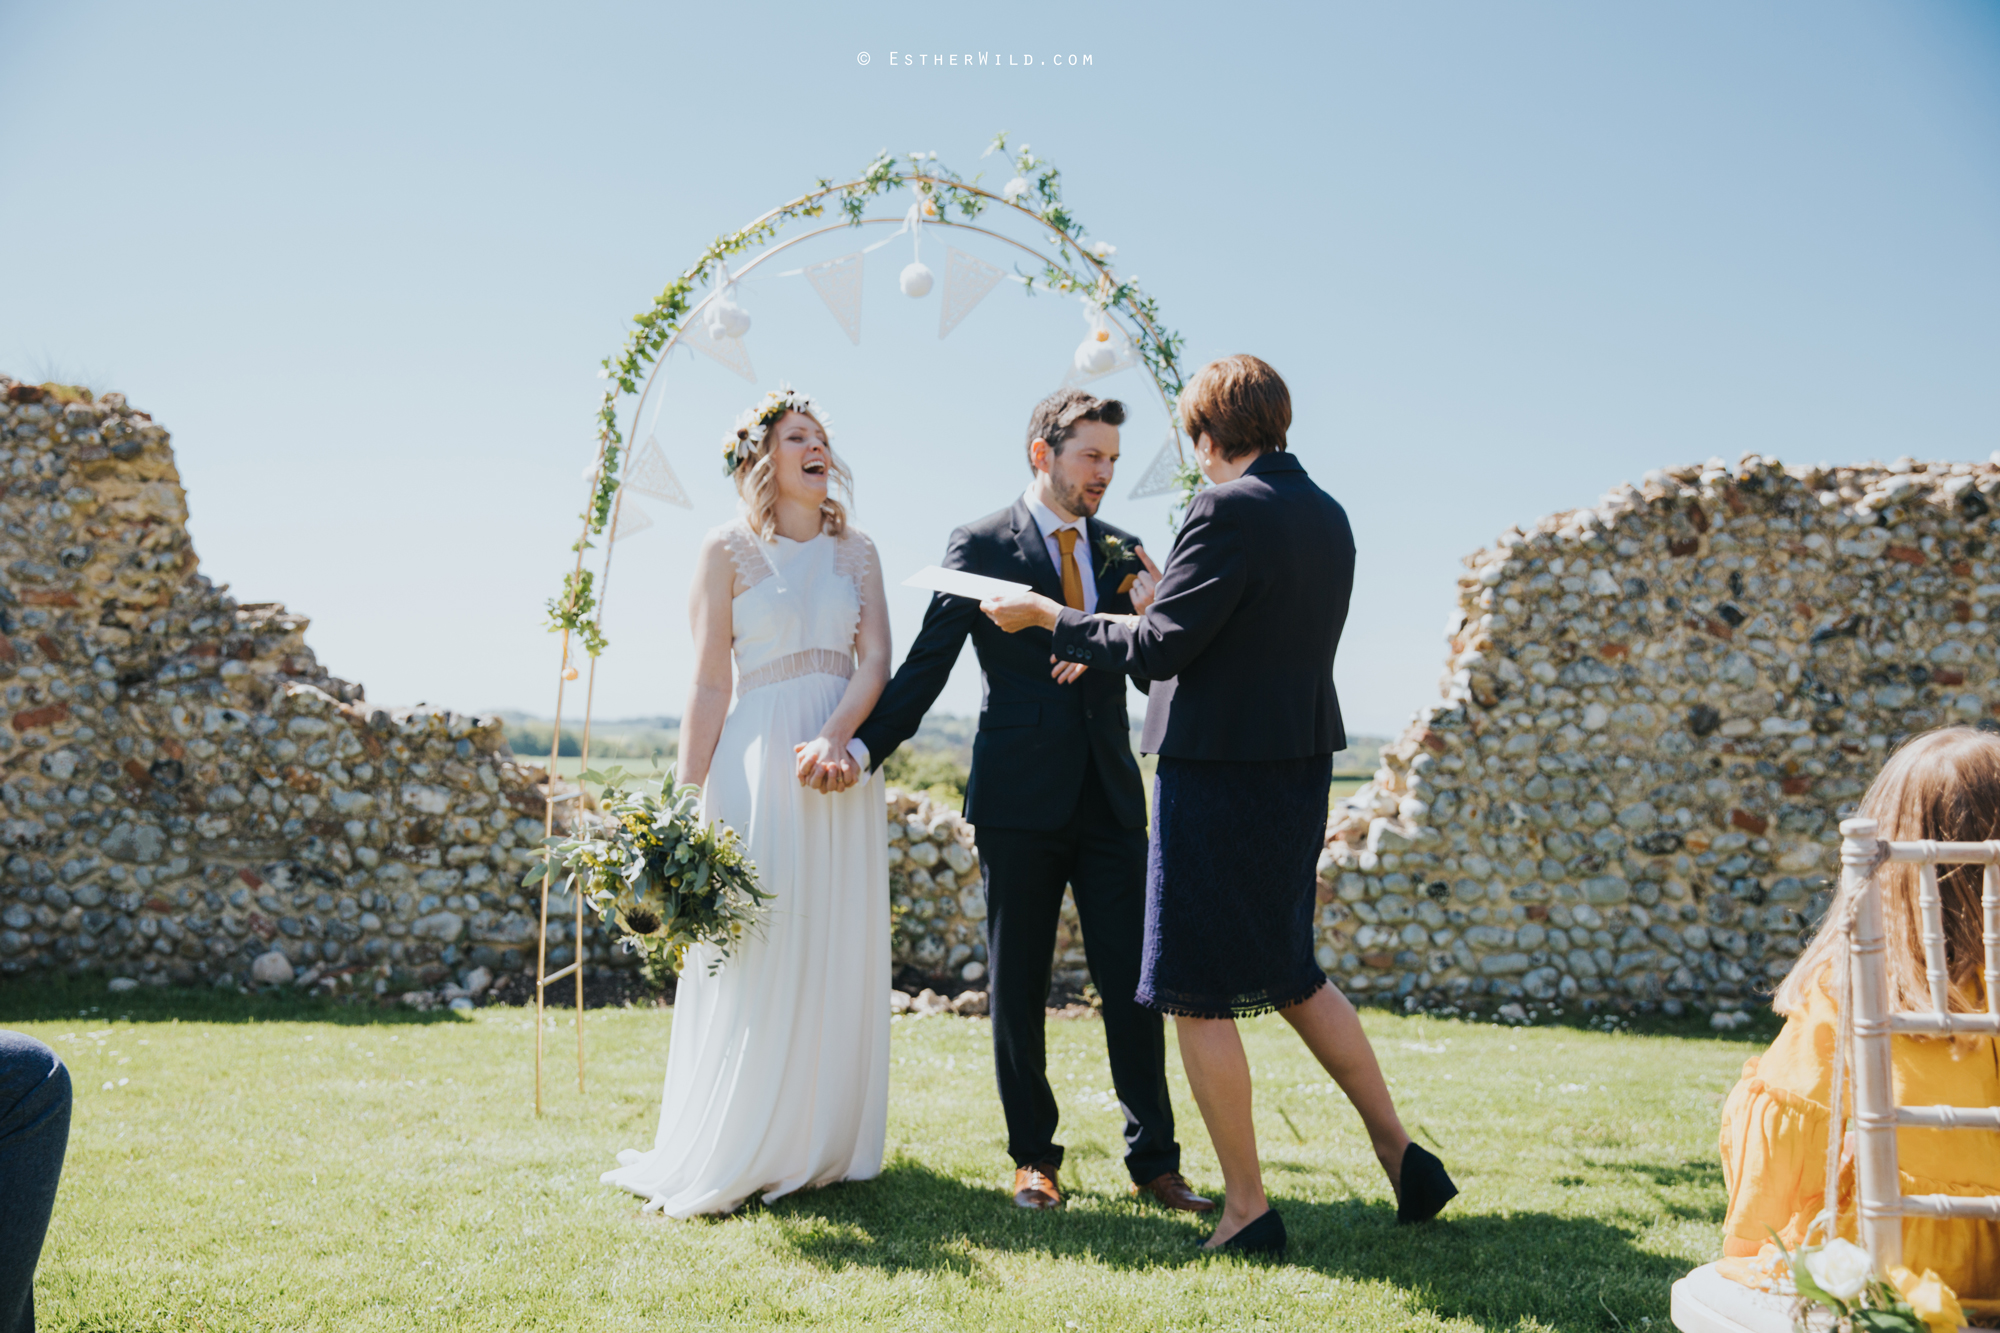 IMG_0746Cley_Barn_Drift_Norfolk_Coast_Wedding_Copyright_Esther_Wild_Photographer_.jpg